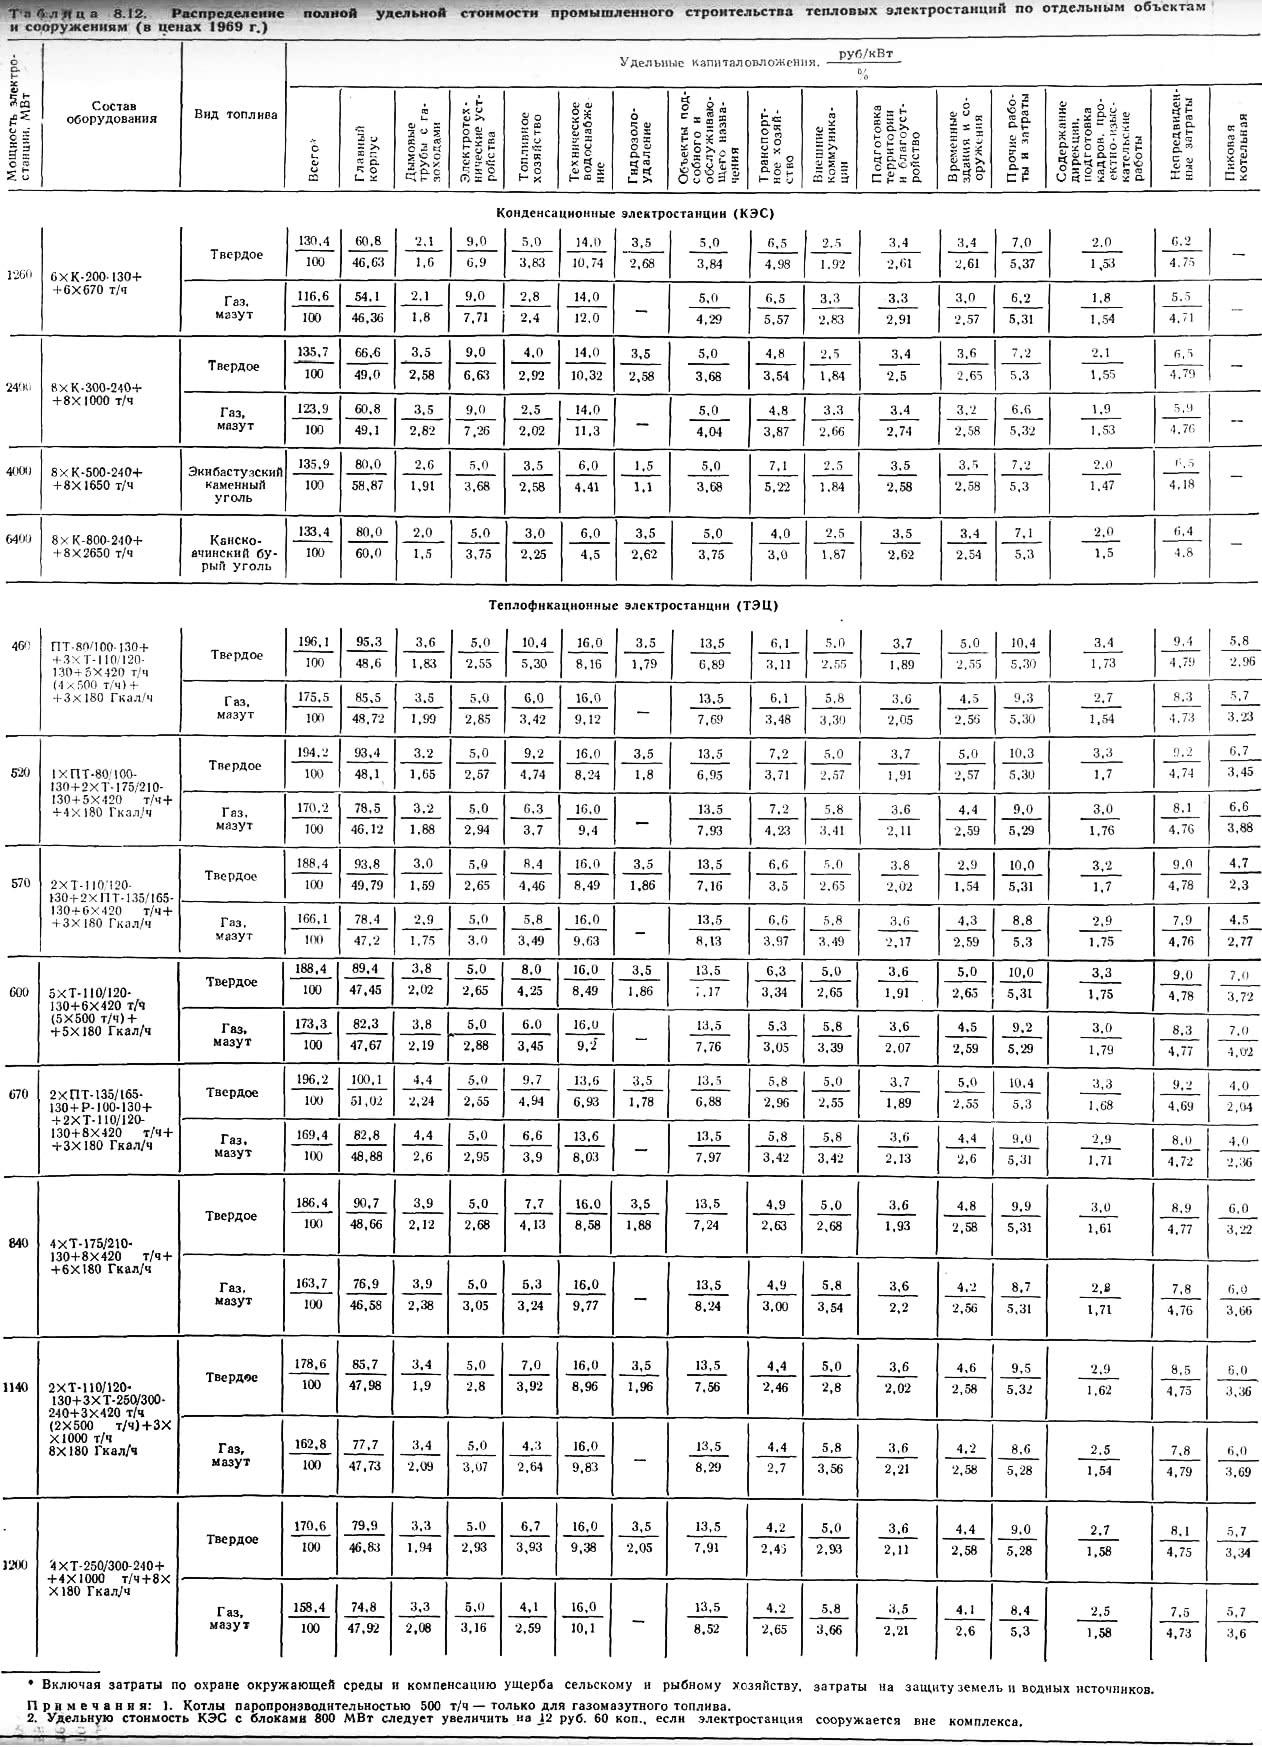 Таблица 8.12.